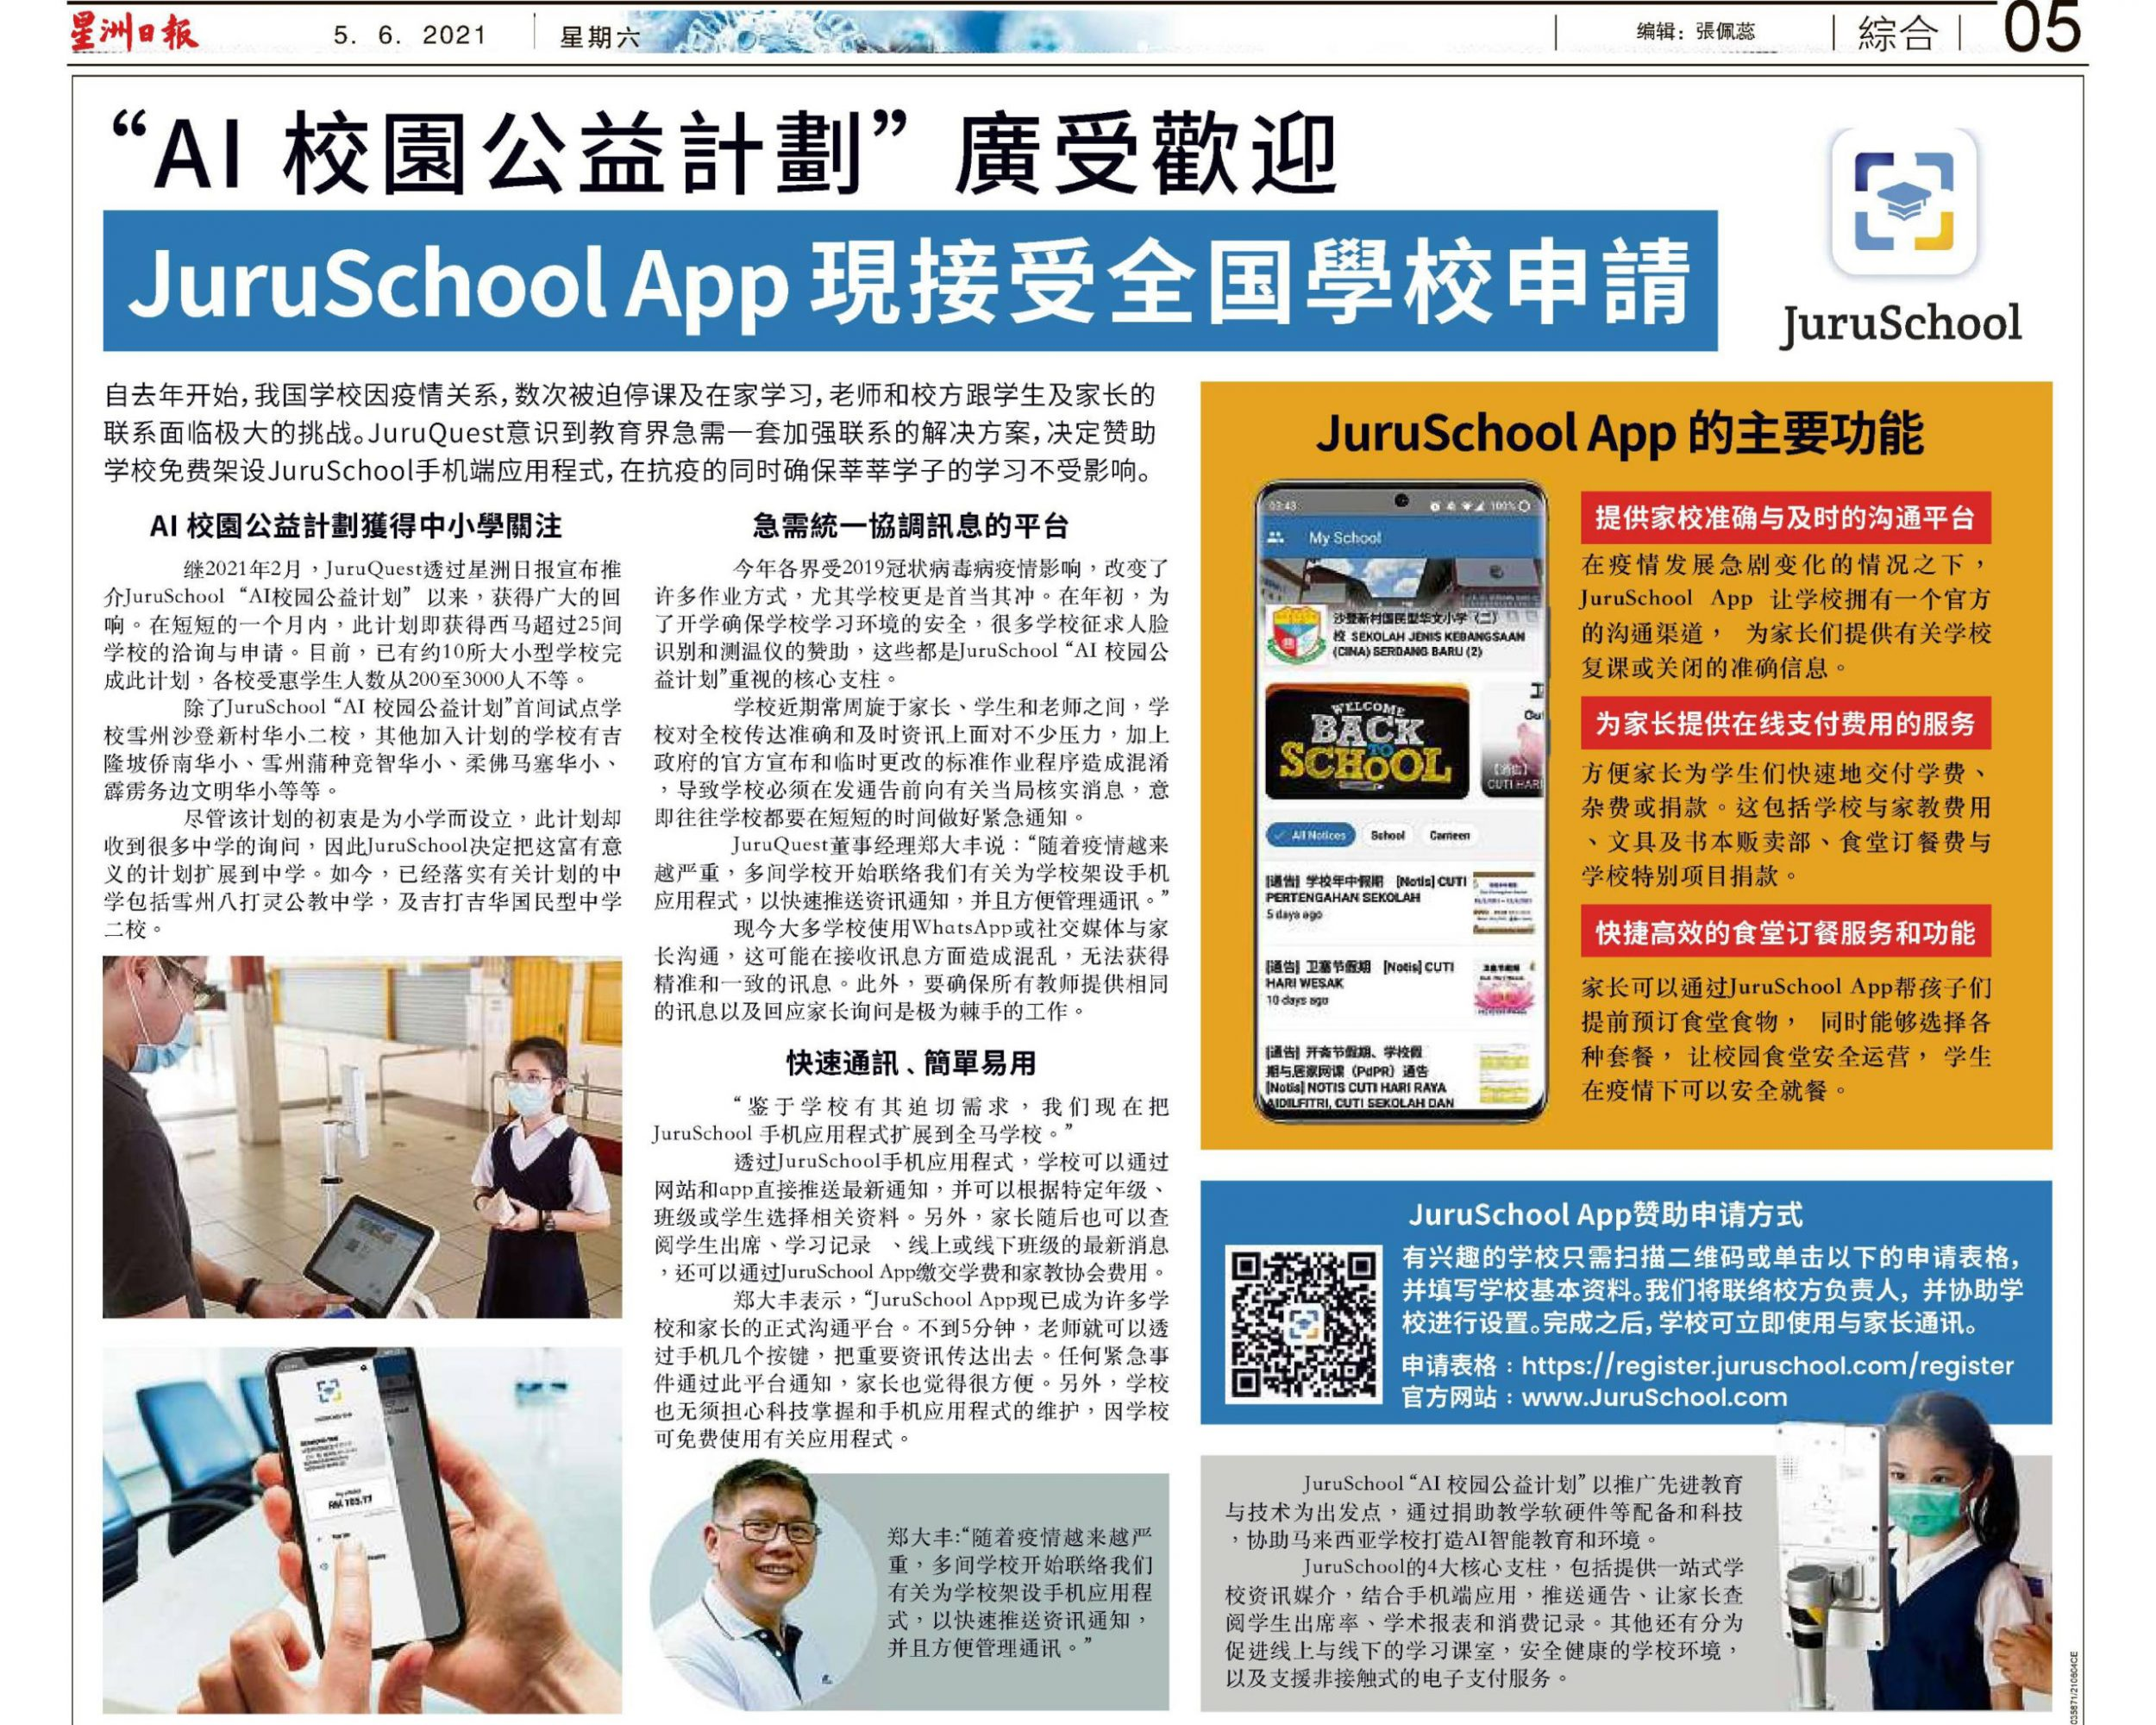 JuruSchool in Sin Chew Newspaper on 5.6.2021